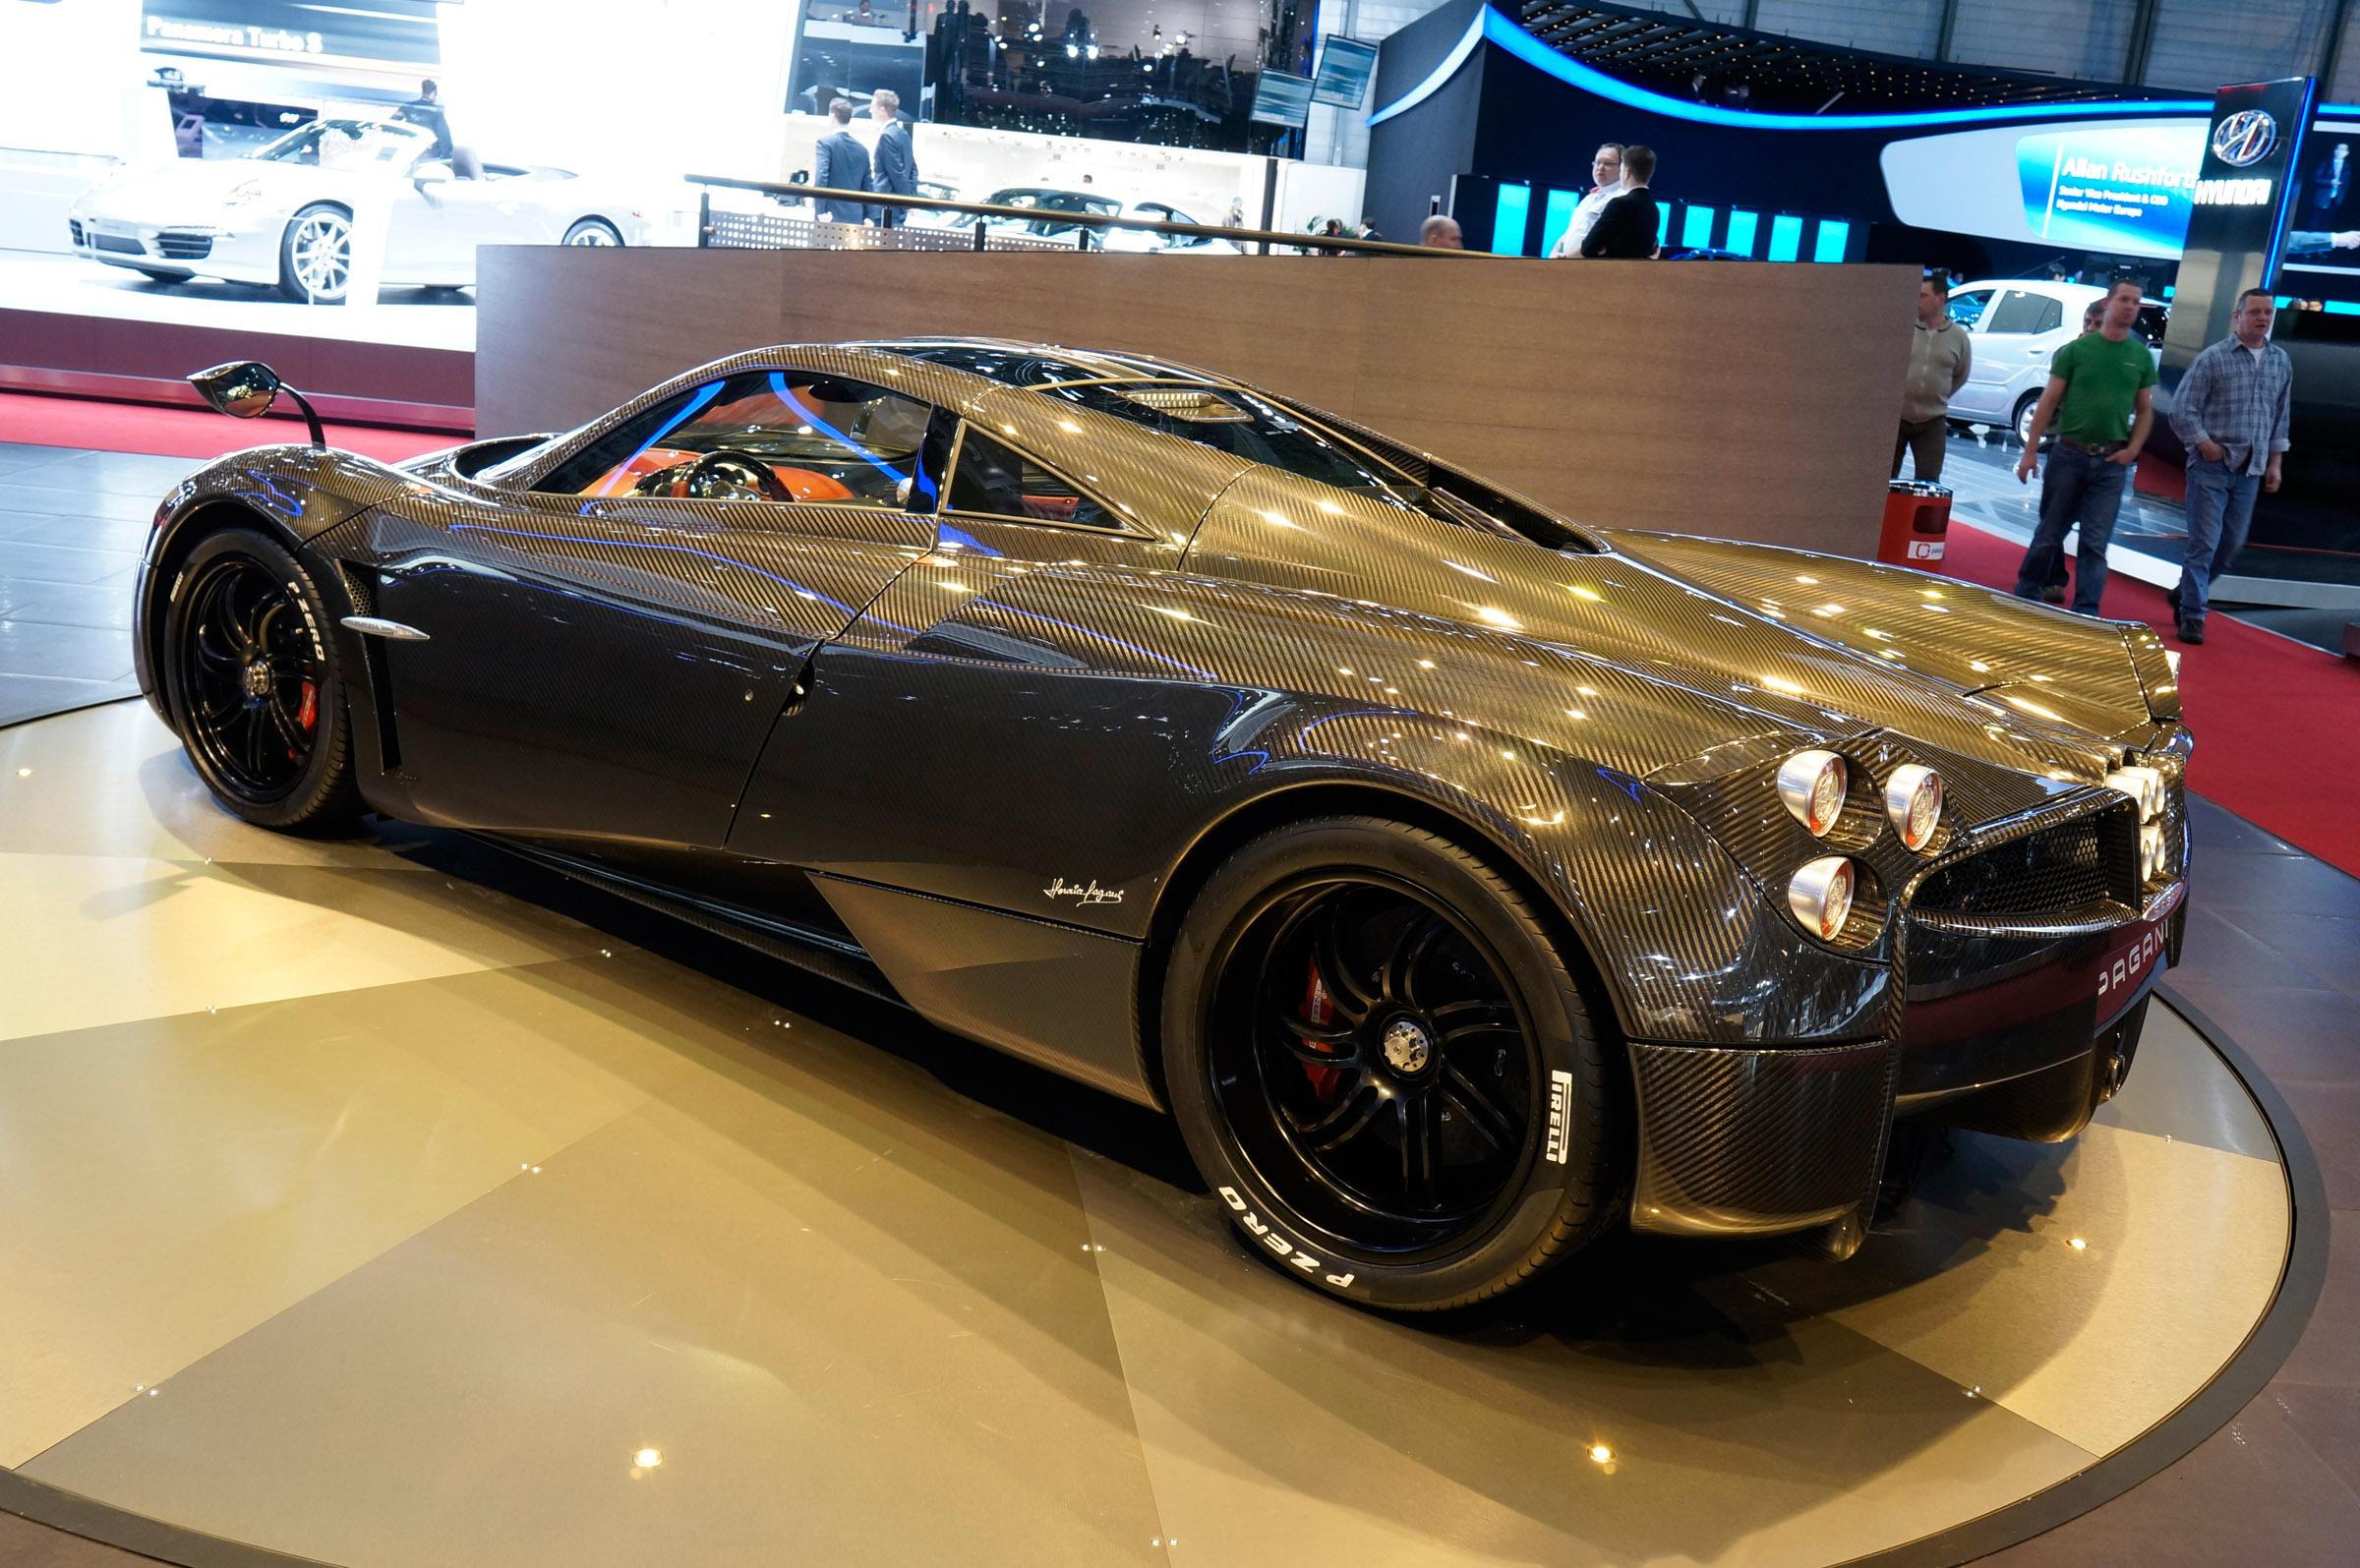 Bac Mono Price >> 2012 Geneva Motor Show: Pagani Huayra Carbon Edition